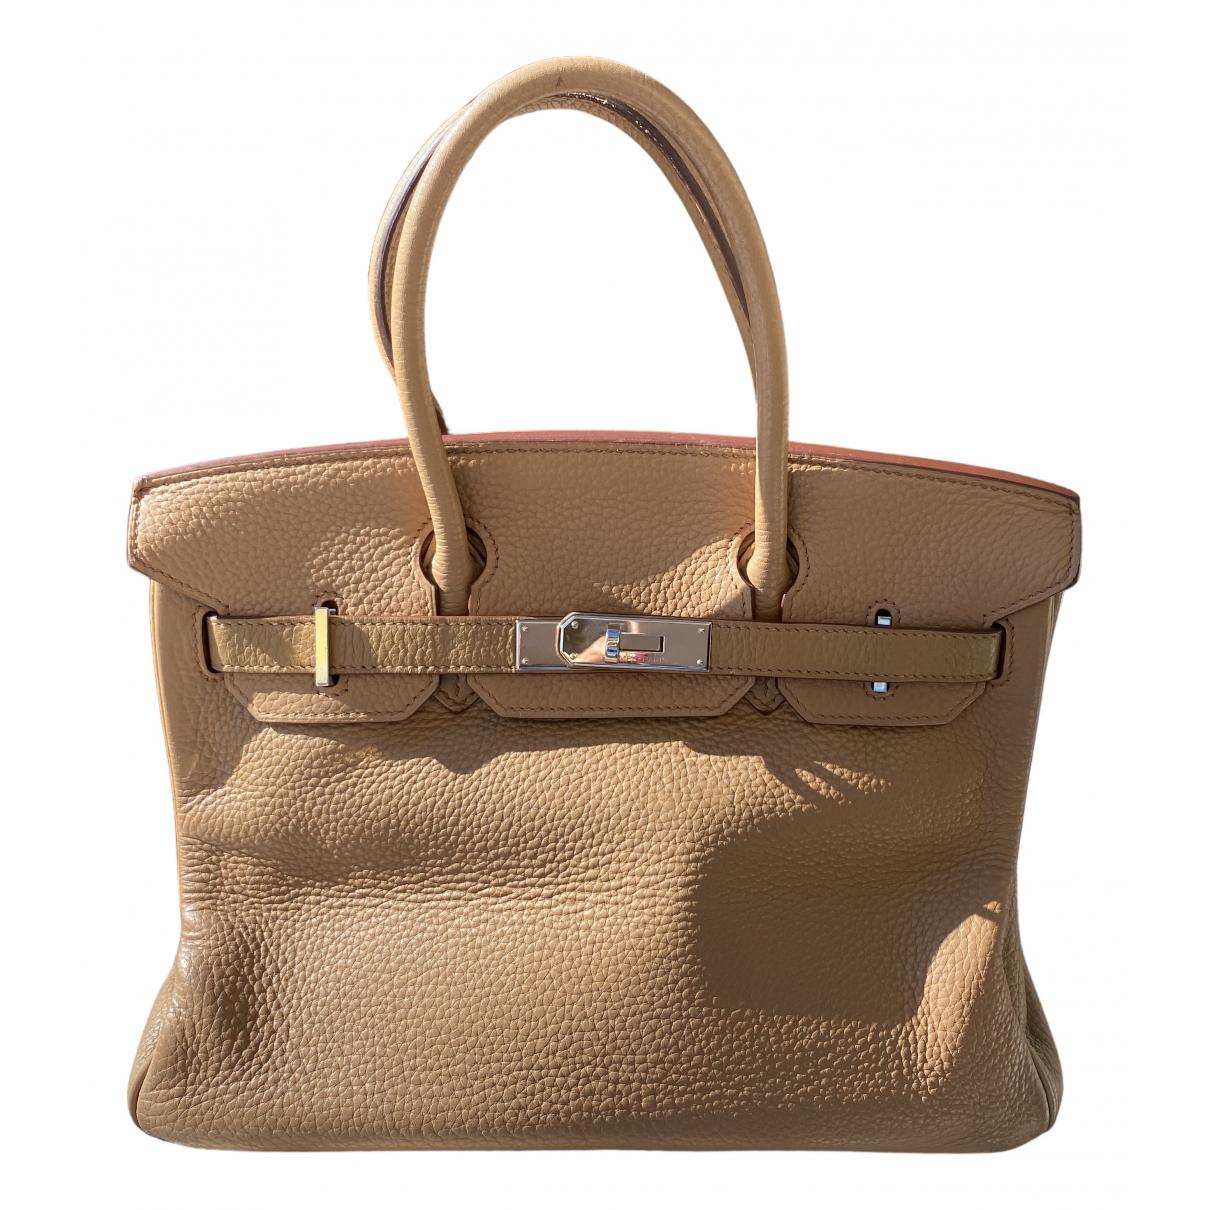 Hermes - Sac a main Birkin 30 pour femme en cuir - beige